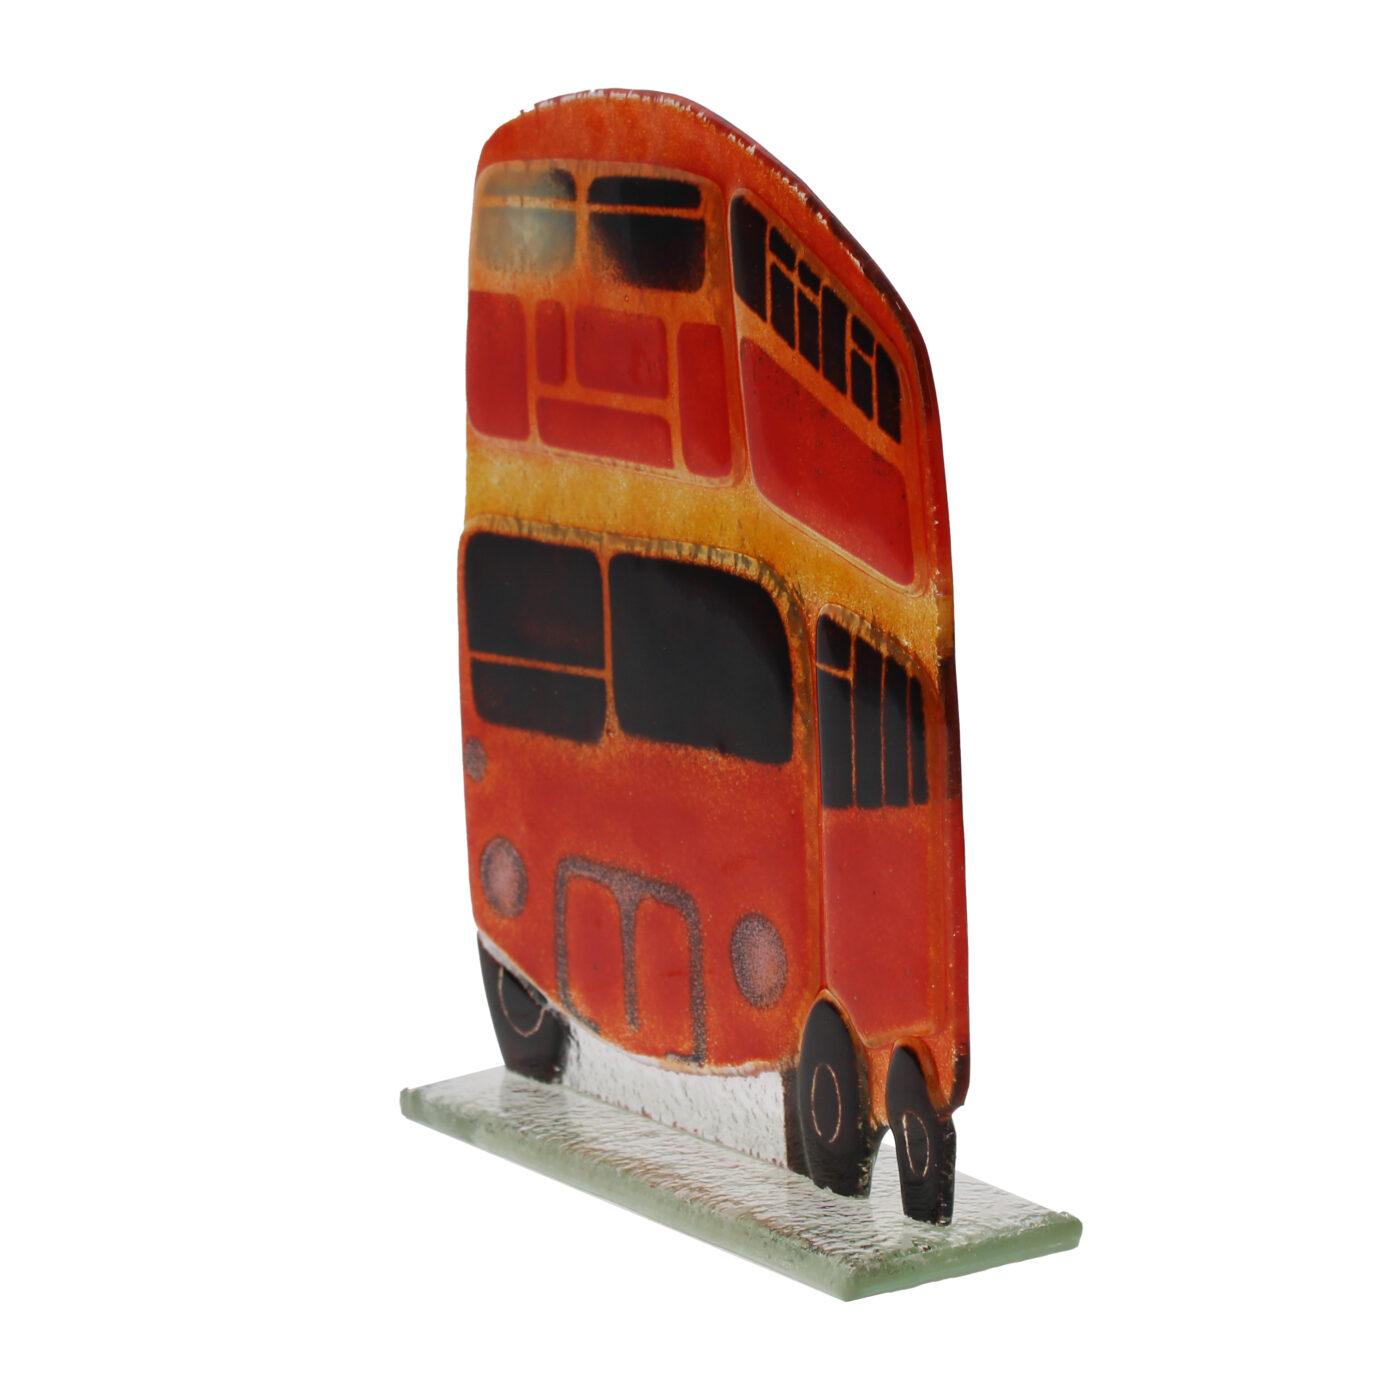 glass london bus